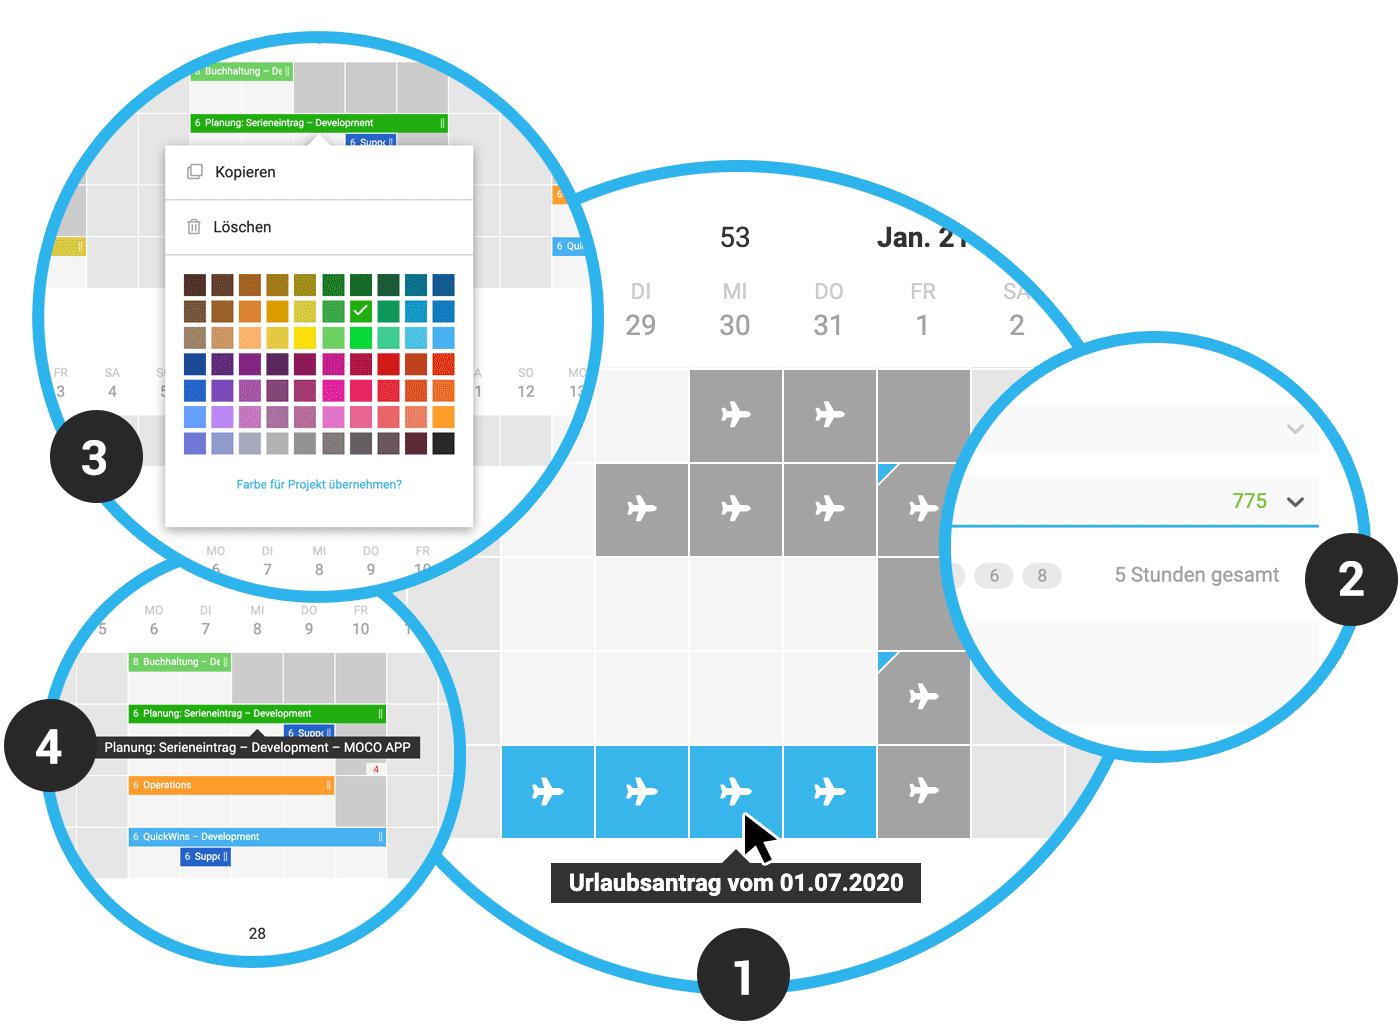 ressourcenplanung updates